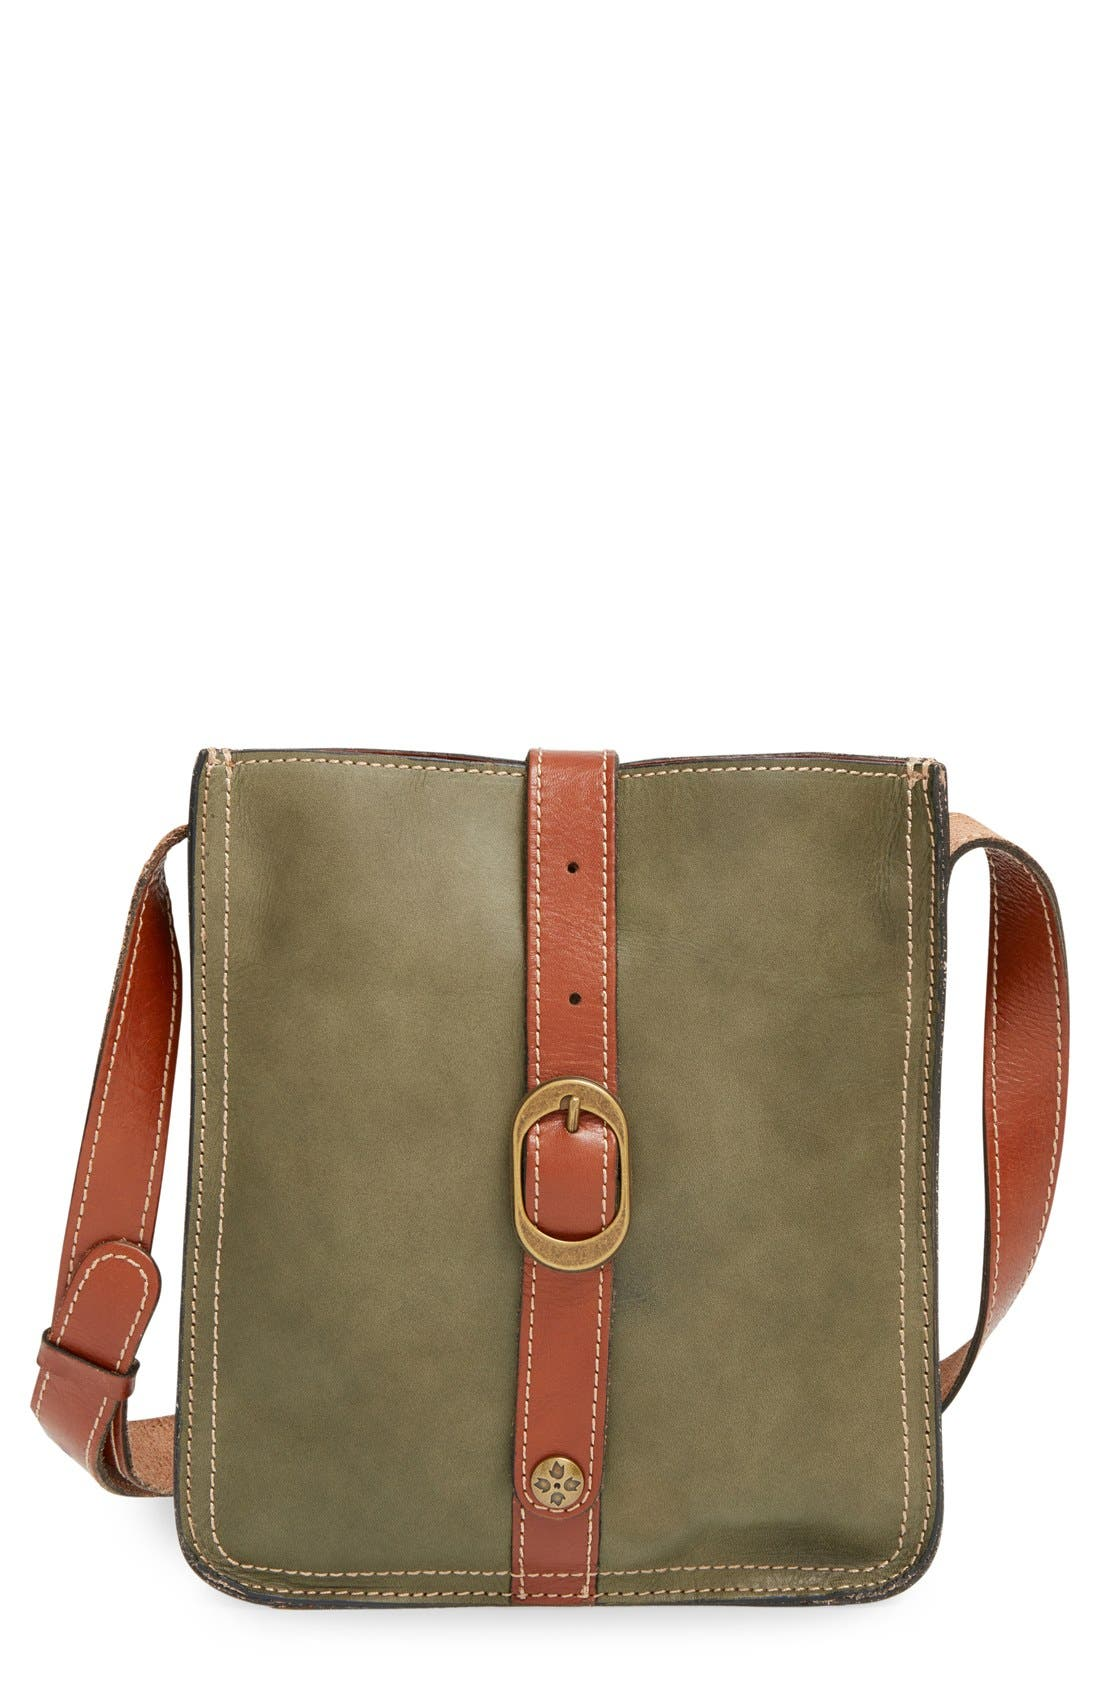 Alternate Image 1 Selected - Patricia Nash 'Venezia' Leather Pouch